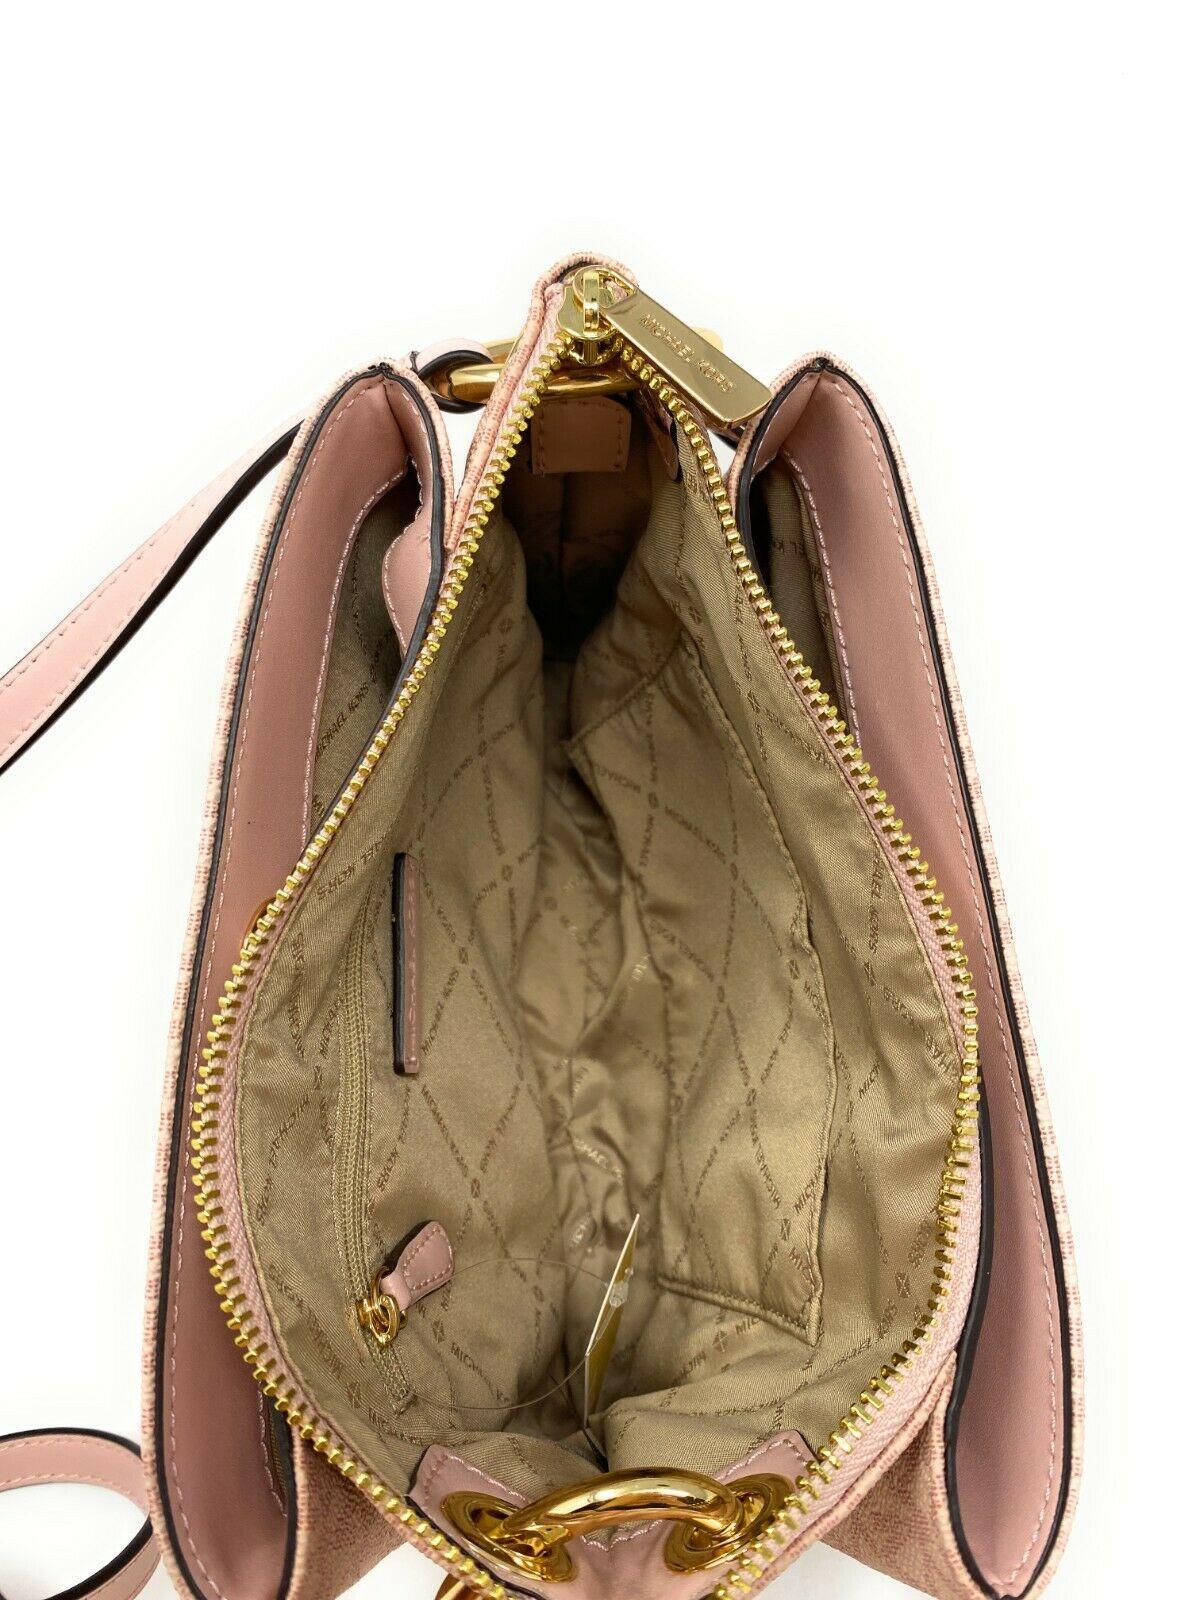 thumbnail 25 - Michael Kors Nicole Large Triple Compartment Crossbody Bag MK Purse